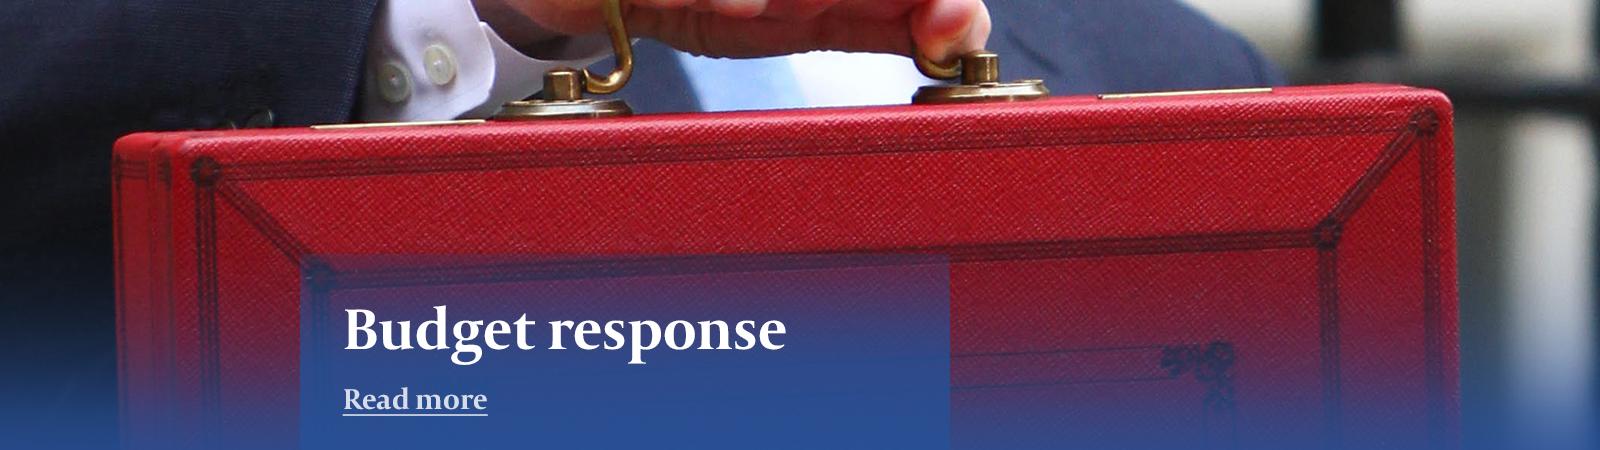 James Hambro & Partners budget response banner